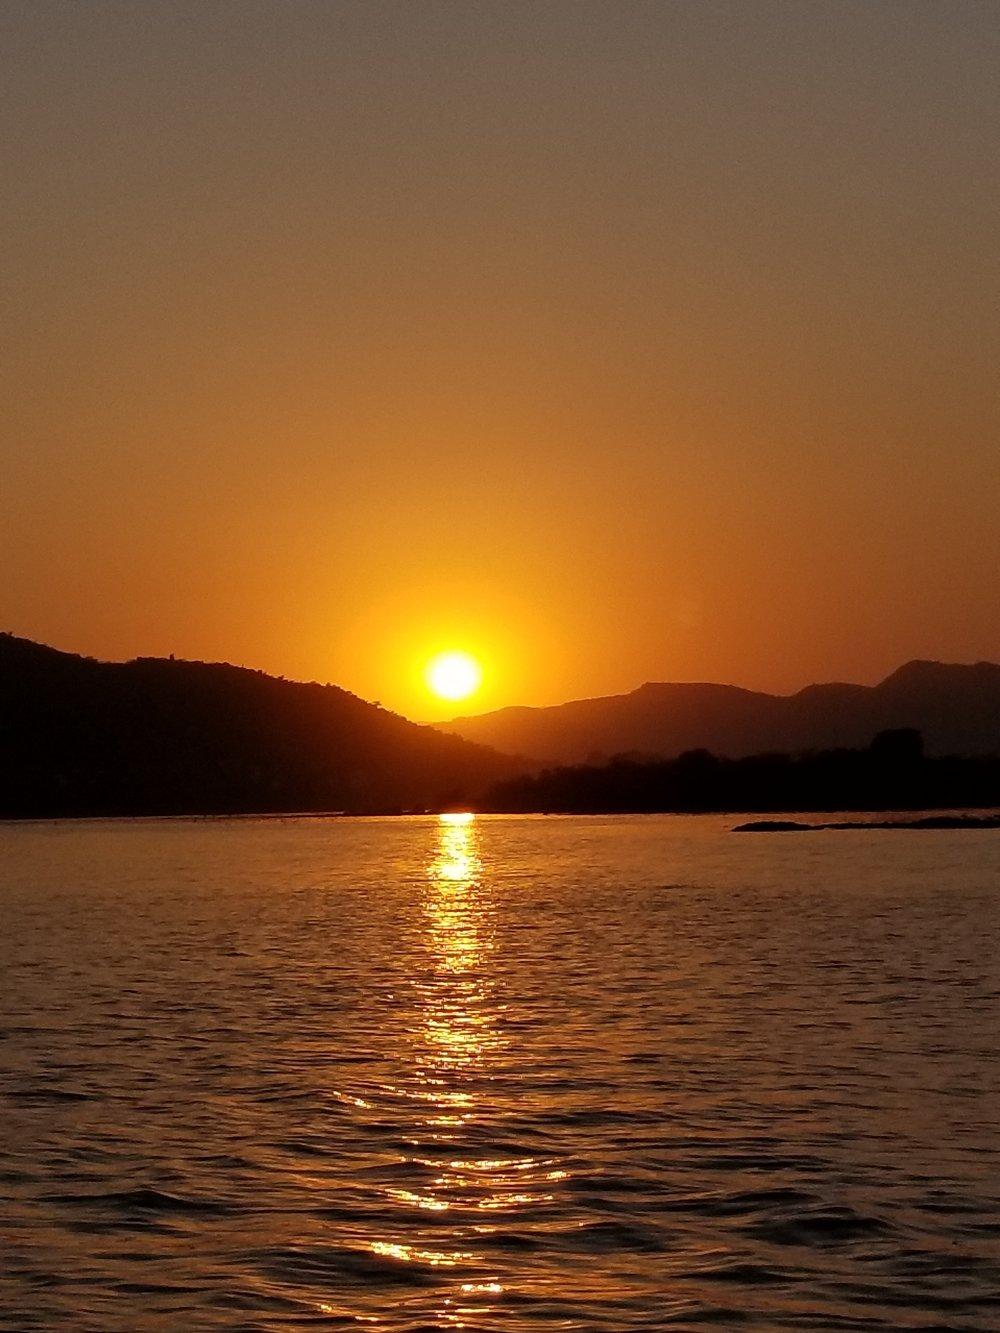 sunset on Lake Pichola